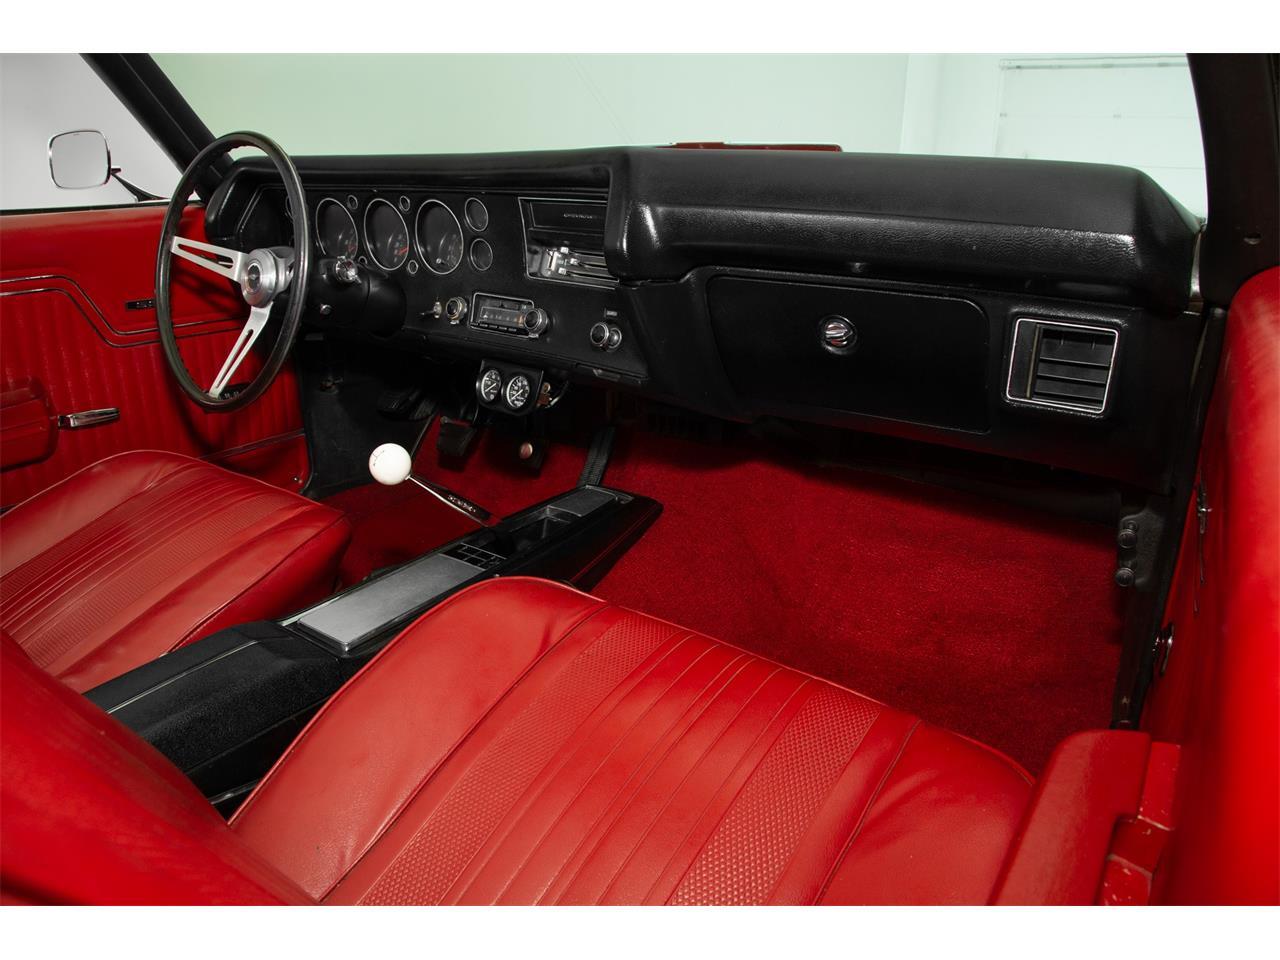 1970 Chevrolet Chevelle (CC-1246364) for sale in Des Moines, Iowa